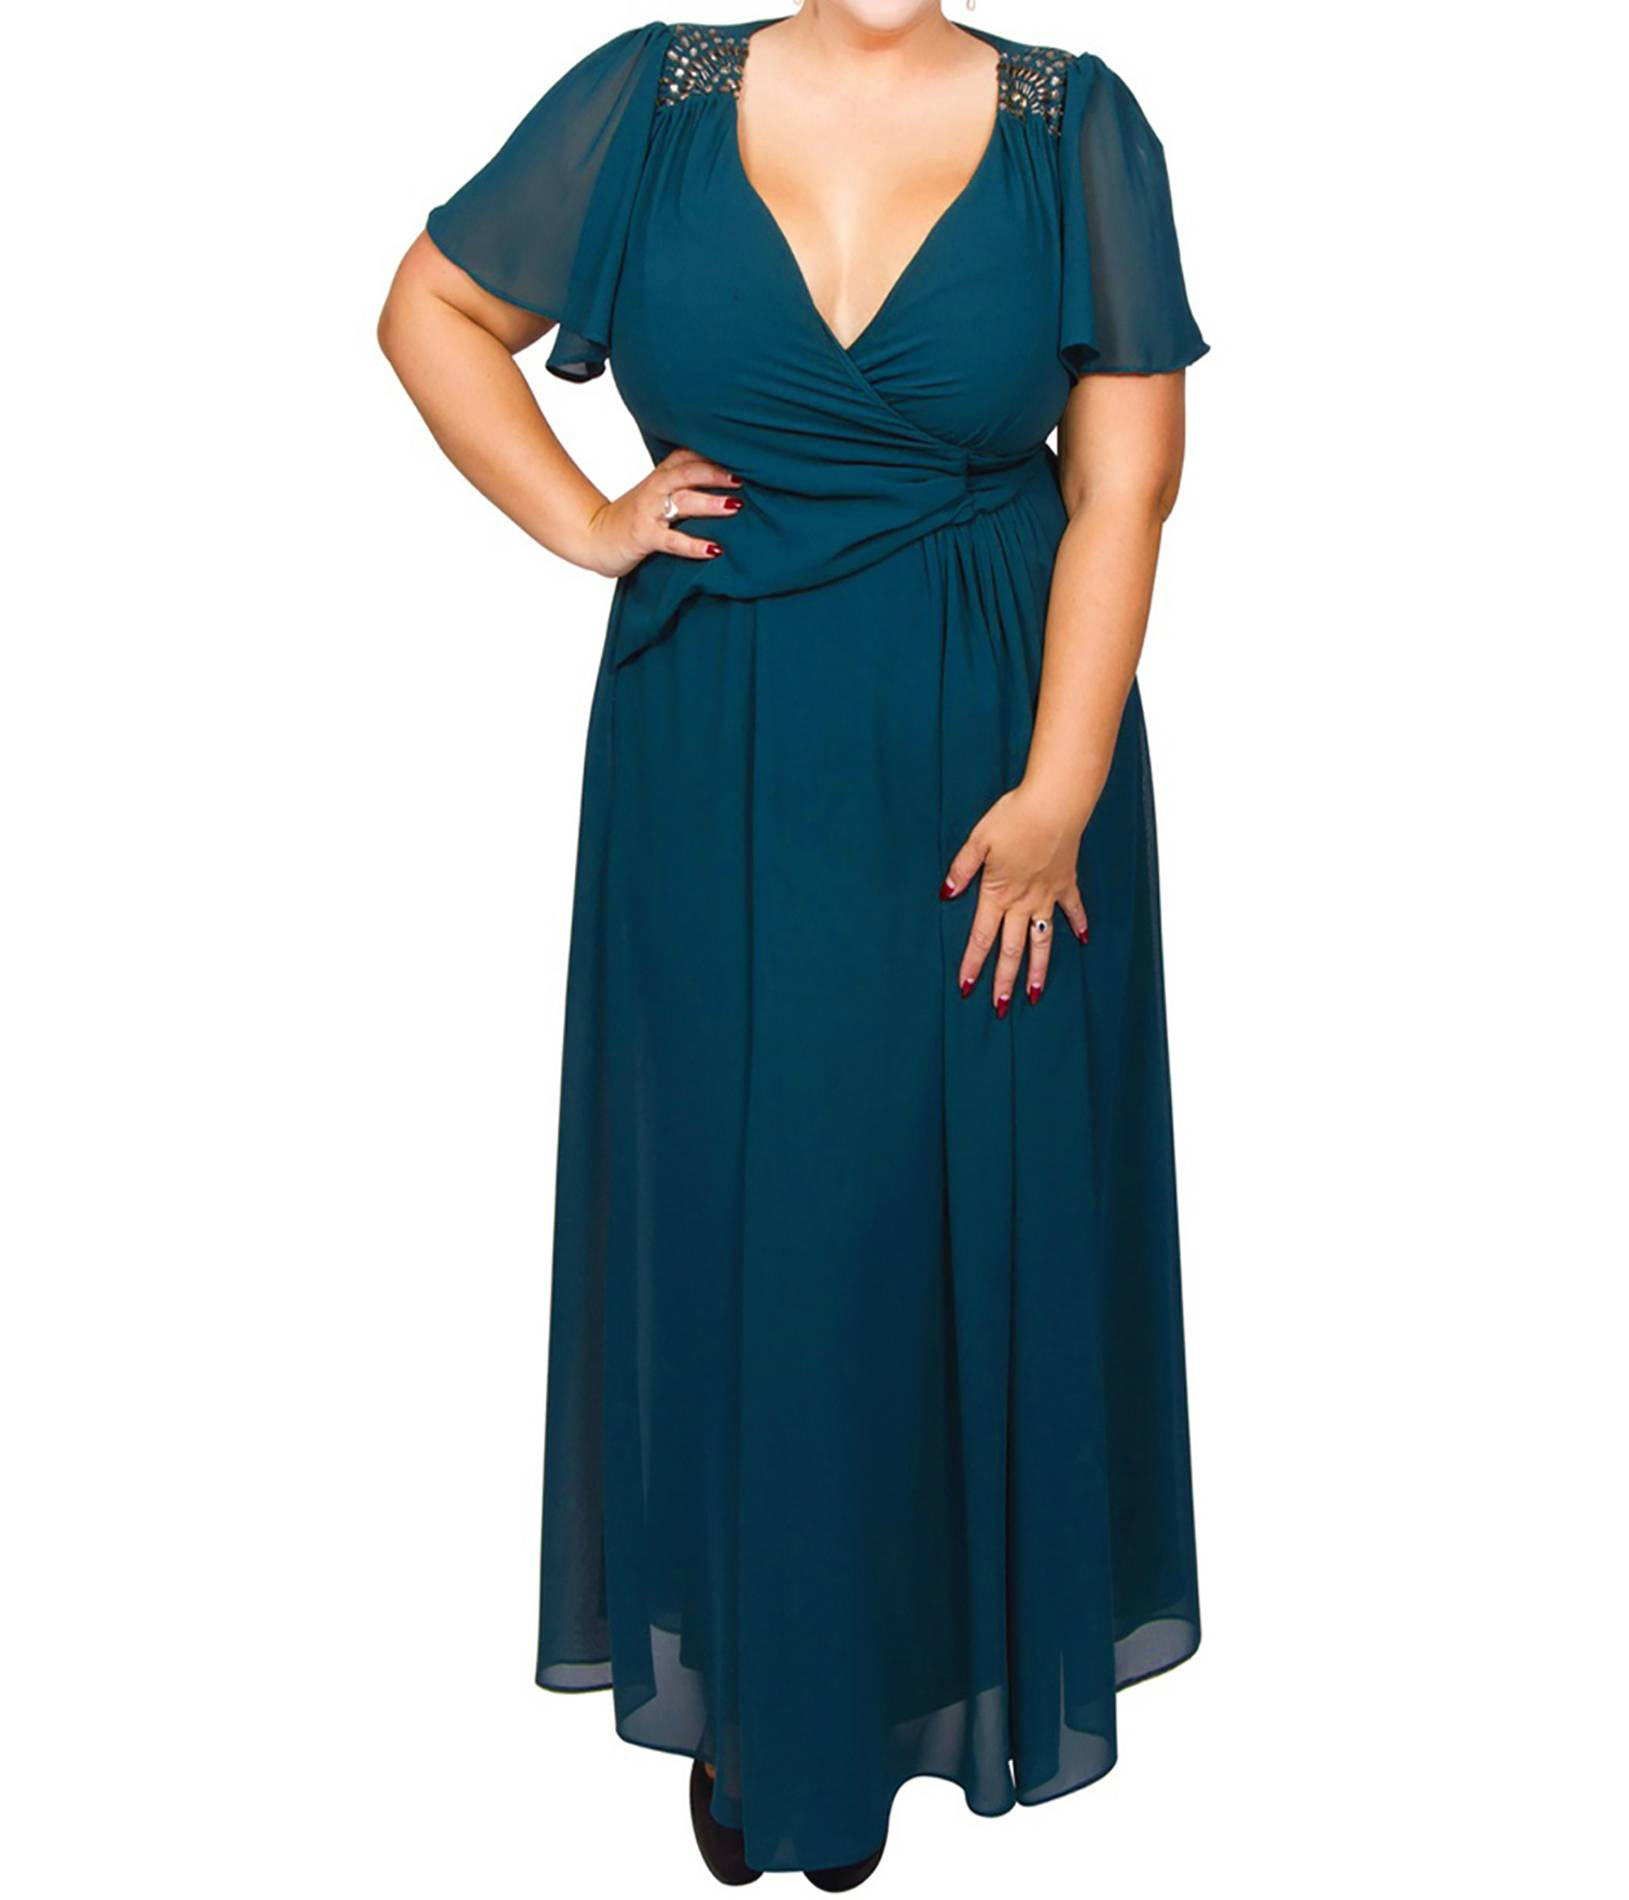 63fce37ed53b ΜΕΓΑΛΑ ΜΕΓΕΘΗ ΦΟΡΕΜΑΤΑ :: Φόρεμα Μάξι Πετρόλ Μουσελίνα - Μόδα σε ...